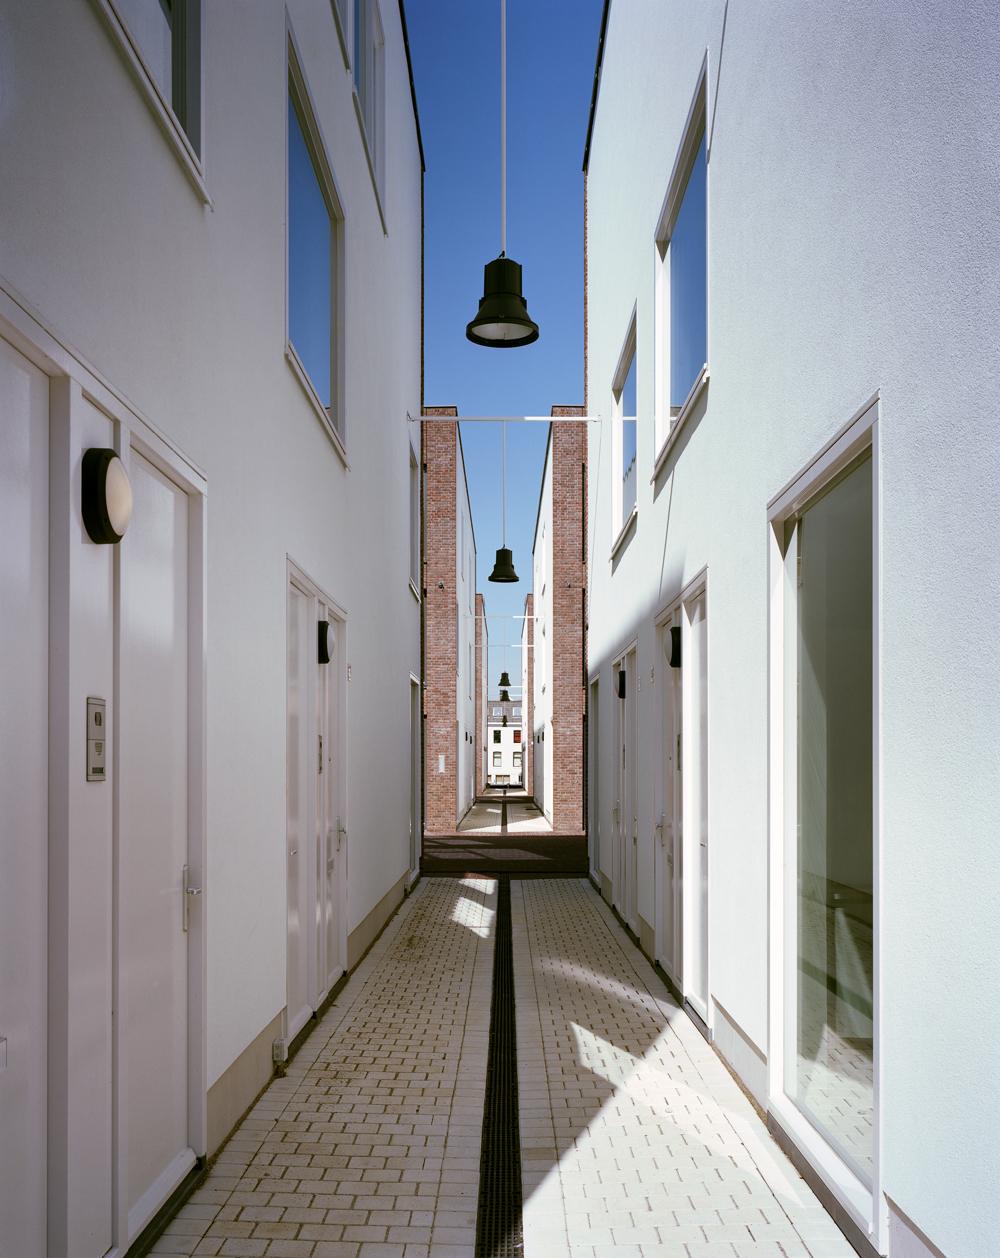 bright white alley facades (photo: Ruben Dario Kleimeer)